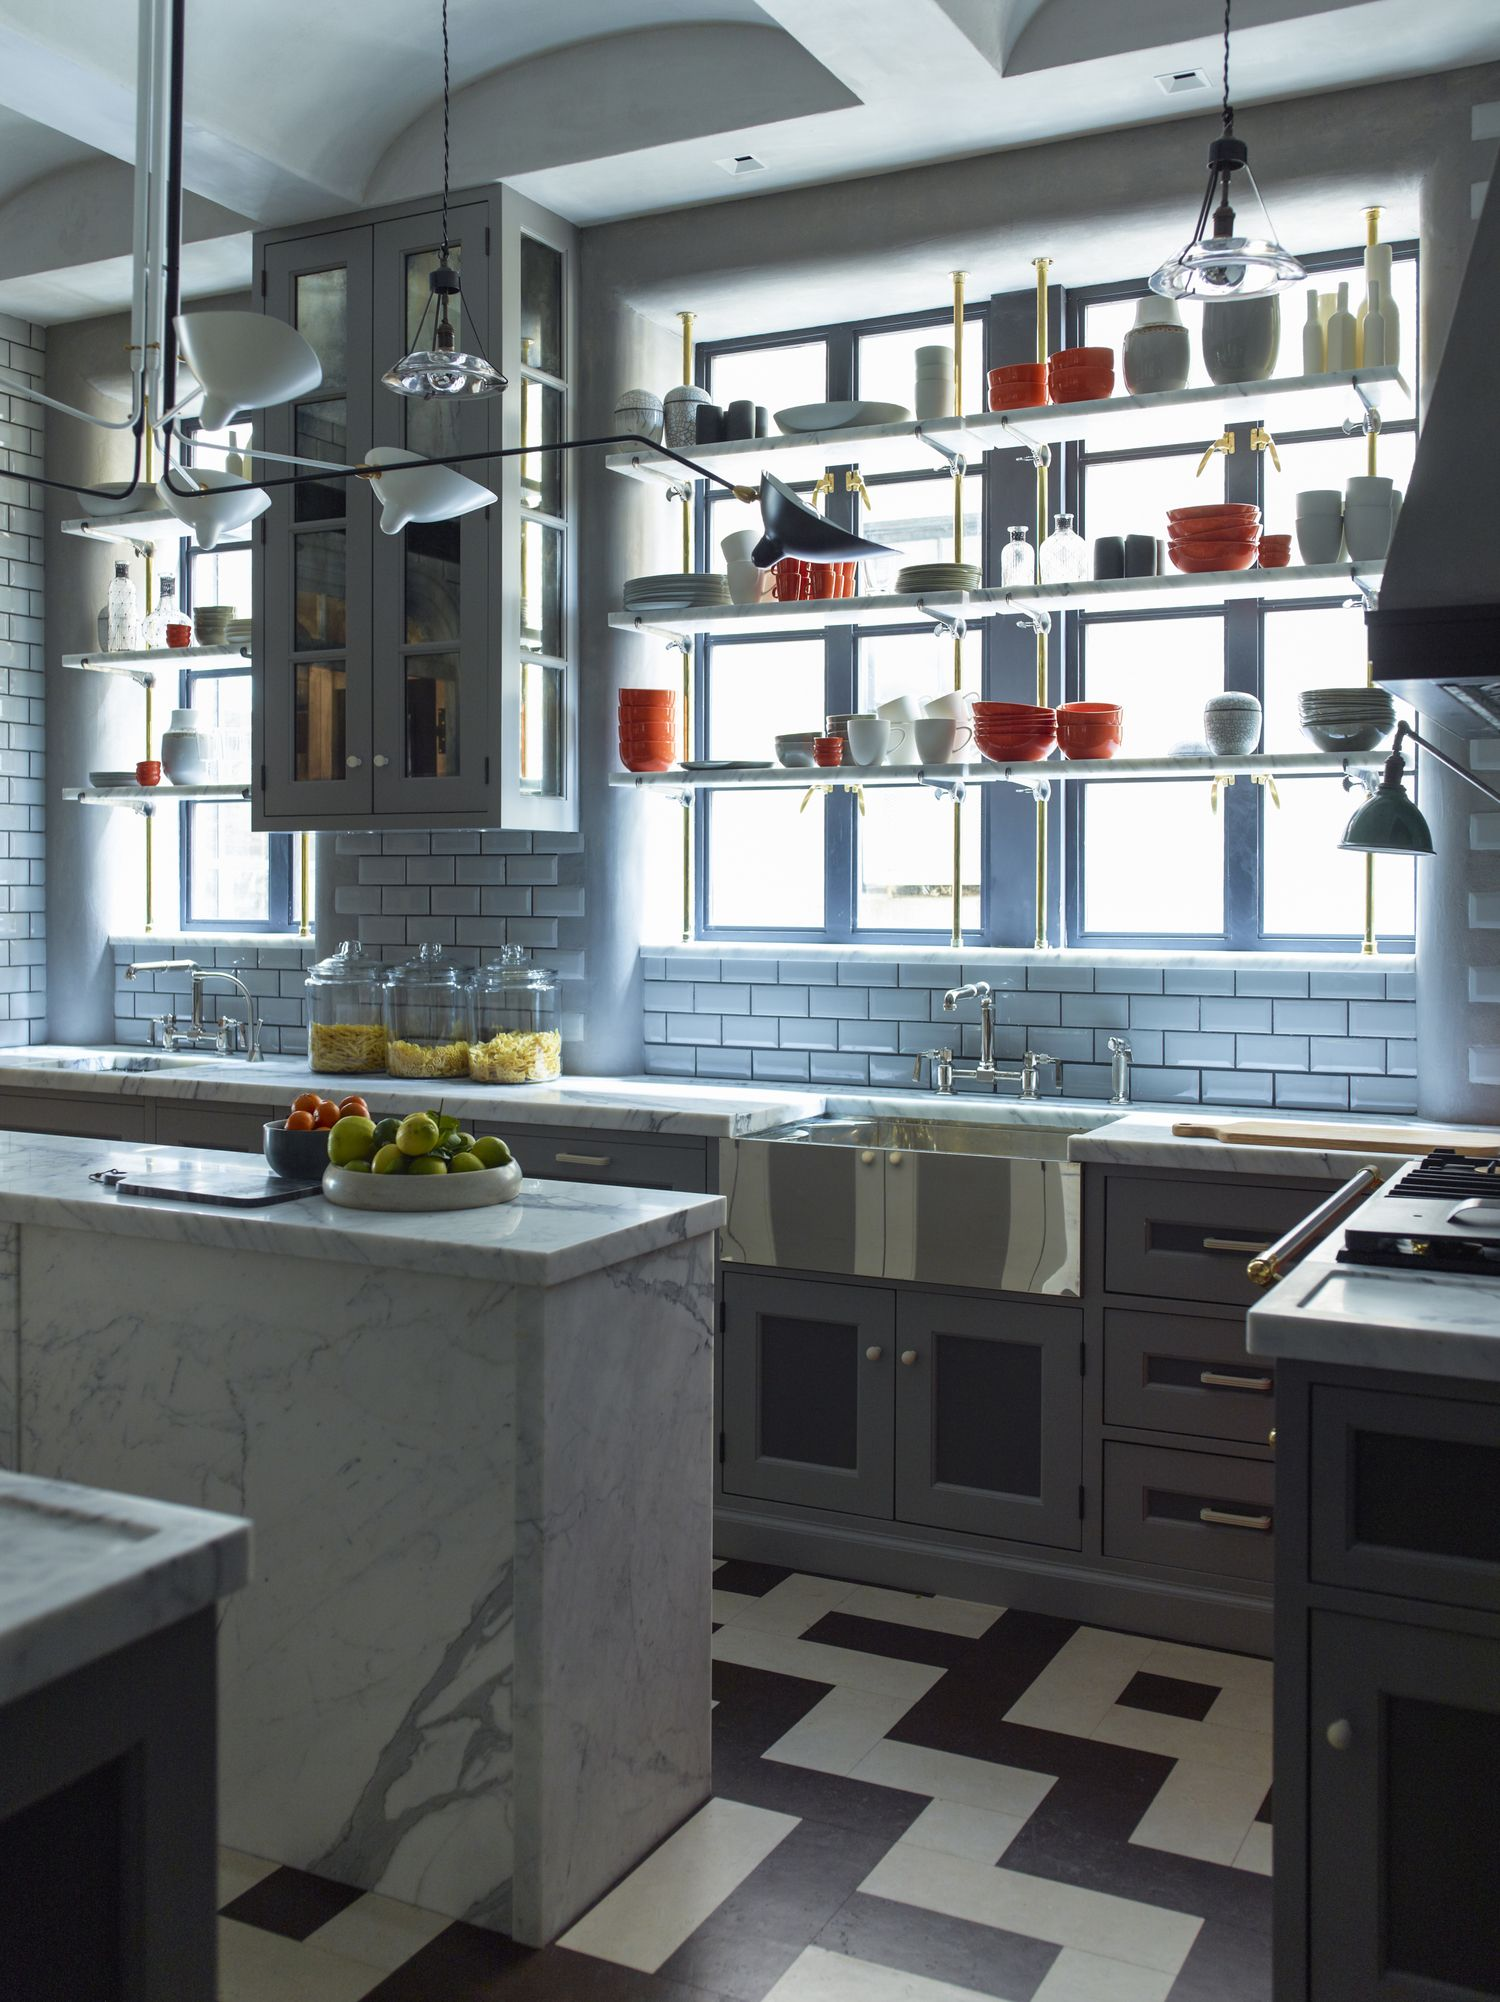 gambrel_ohara_412.jpg Cocinas pequeñas, Cocinas, Alacena